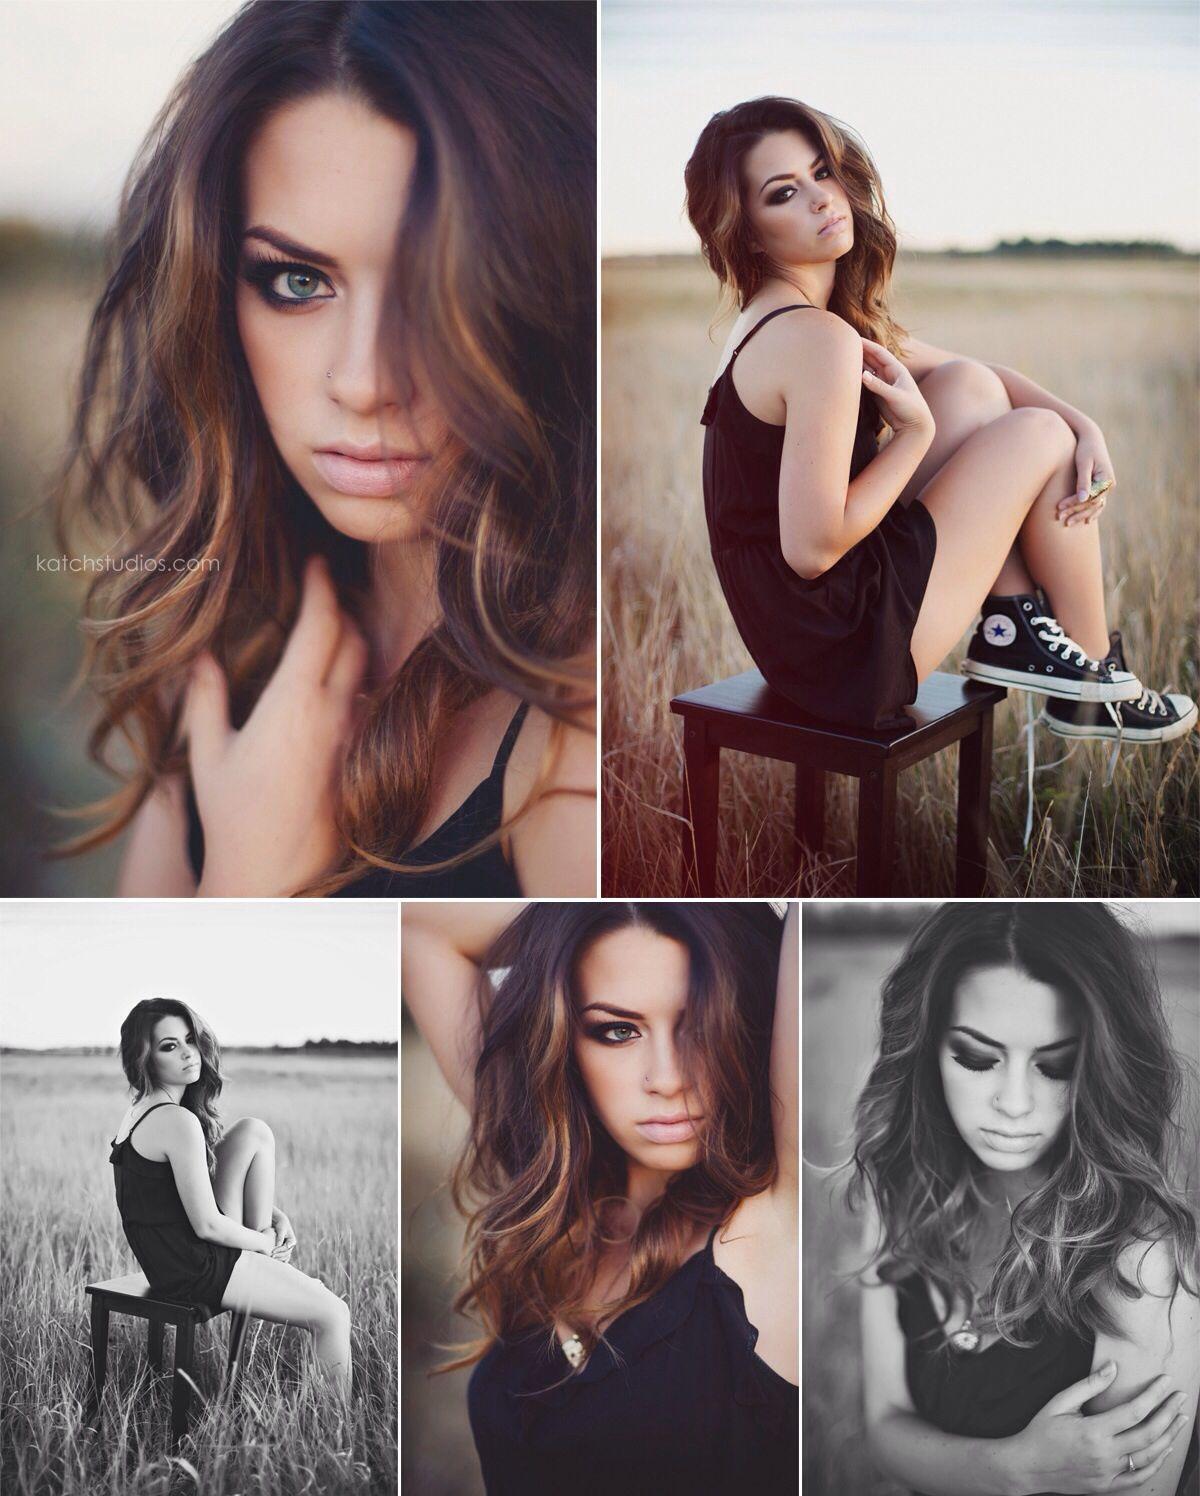 model #poses #photography | photo shoot ideas | pinterest | model